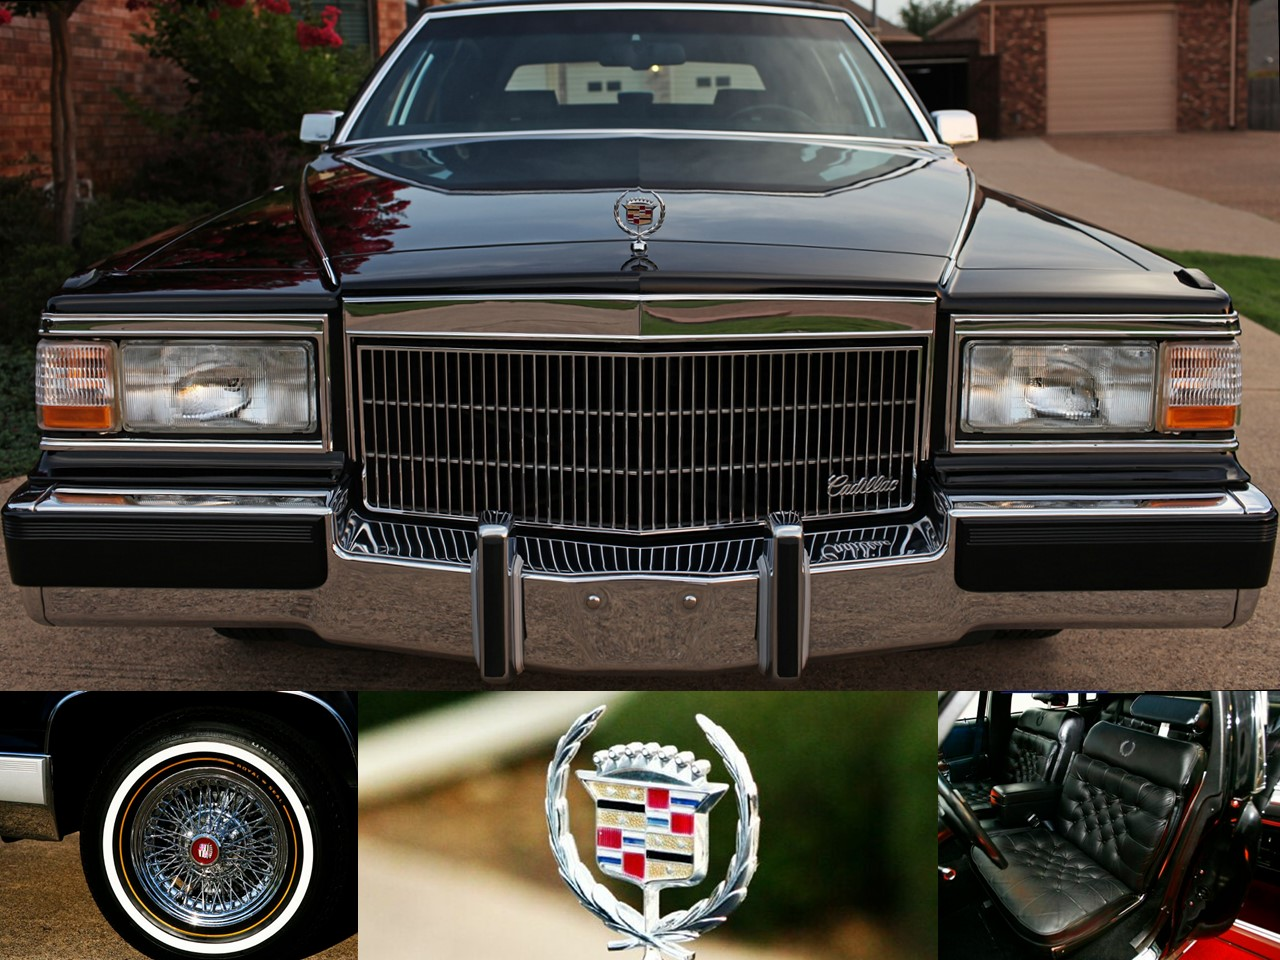 Fuse Box 91 Cadillac Brougham Online Schematics Diagram 91 Cadillac Rims 91 Cadillac  Brougham Fuse Box